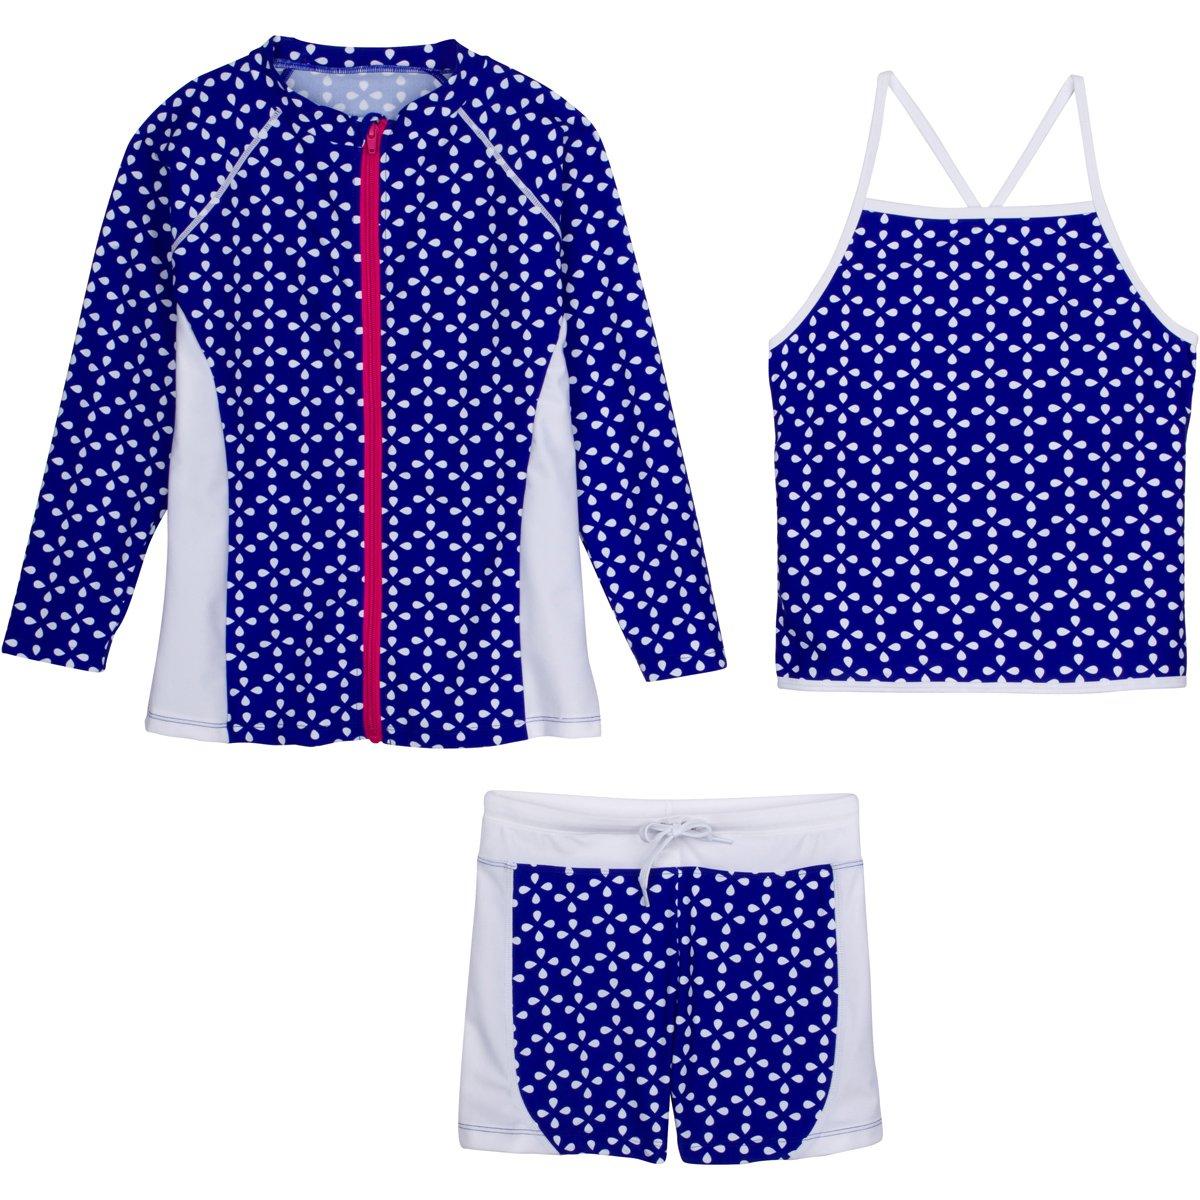 SwimZip Girls Long Sleeve Rash Guard Swim Shorts Set with UPF 50+ Navy 2T SZILSSHORTSET3PC34